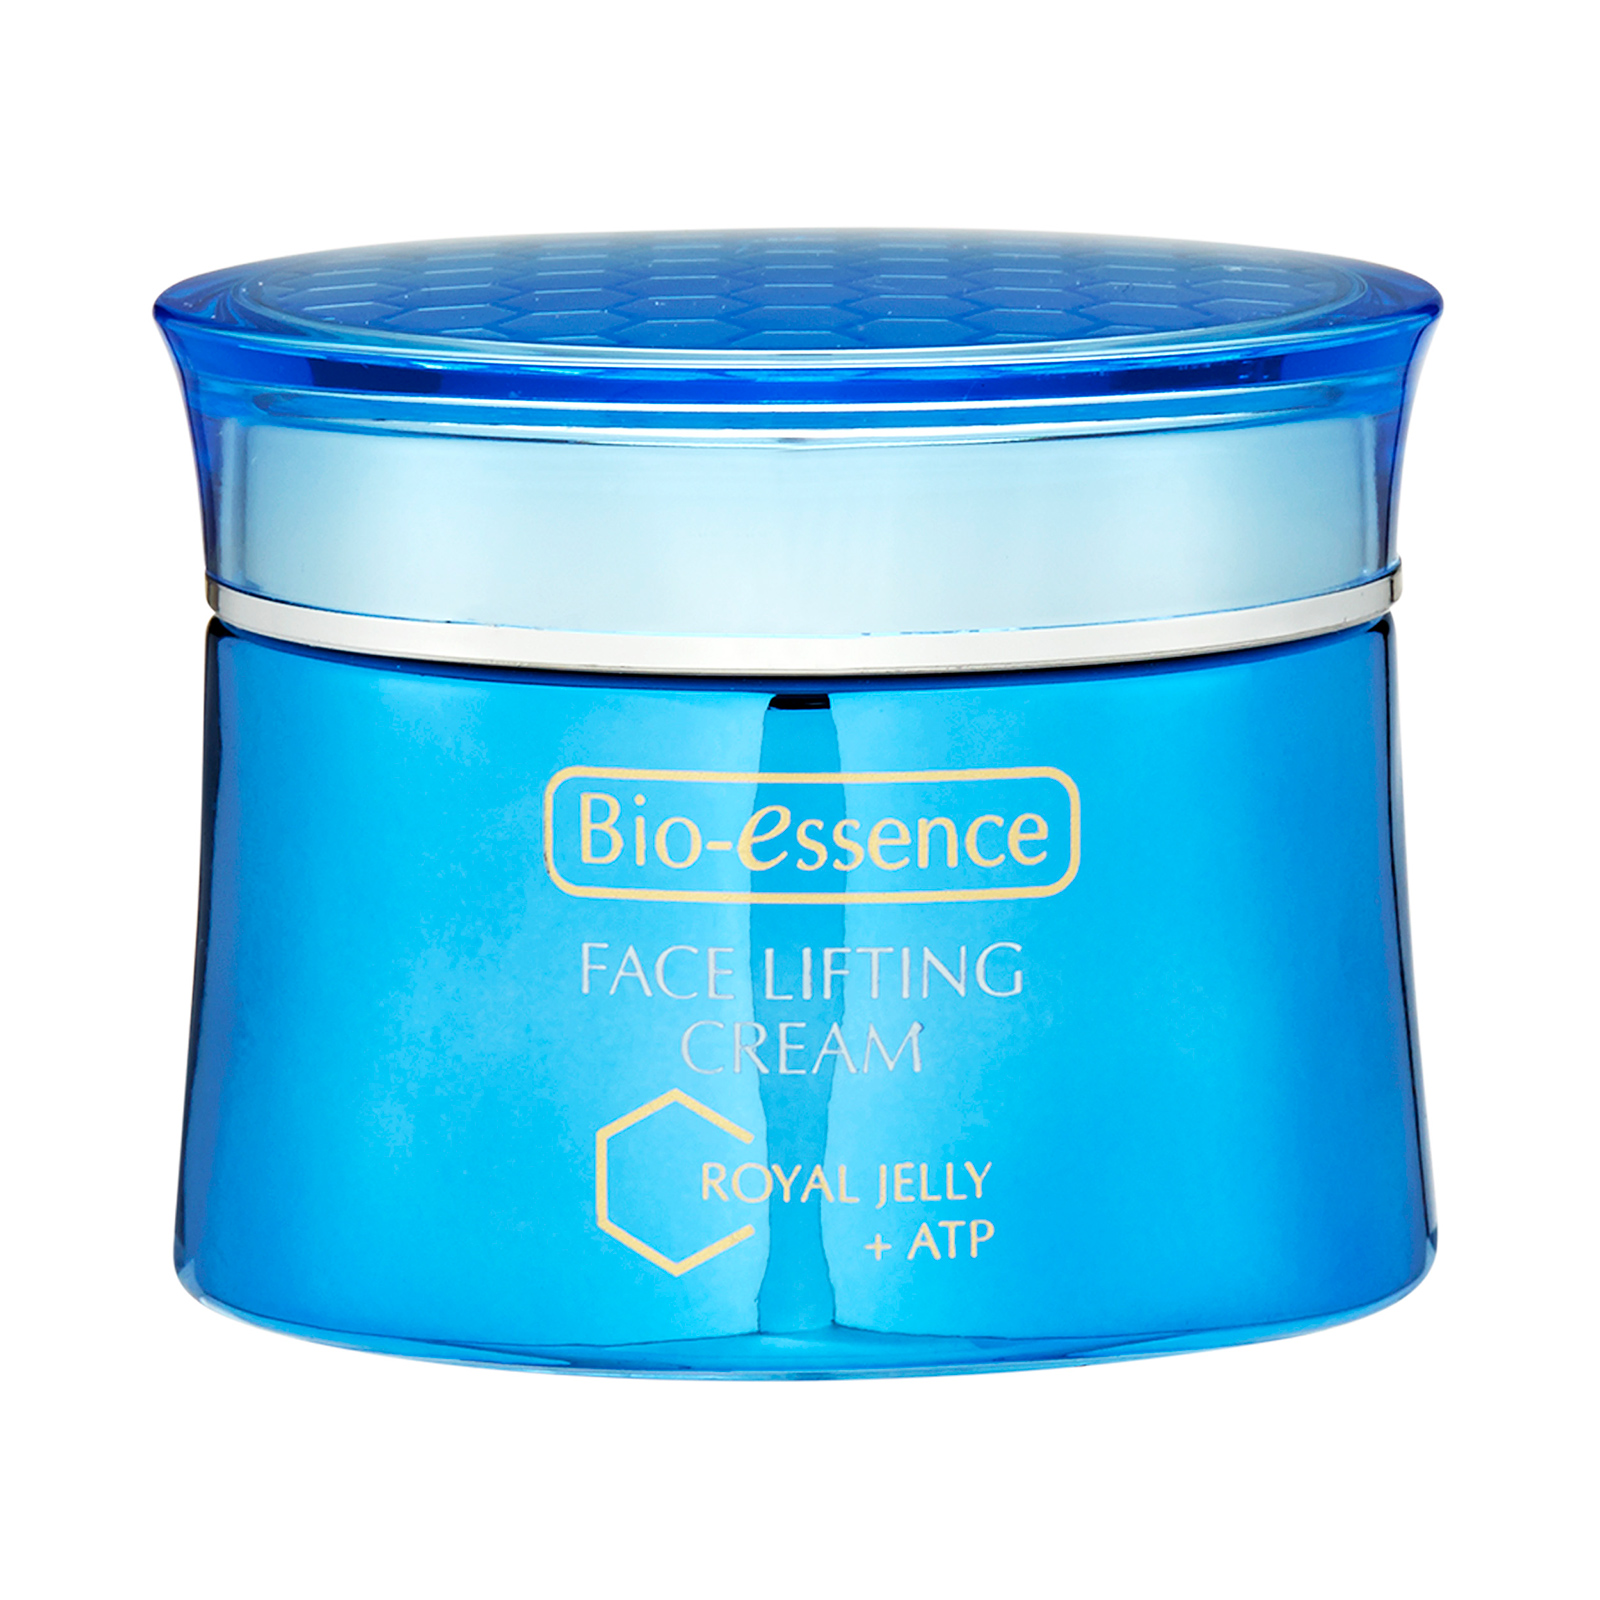 Bio Essence Royal Jelly + ATP Face Lifting Cream 40g,